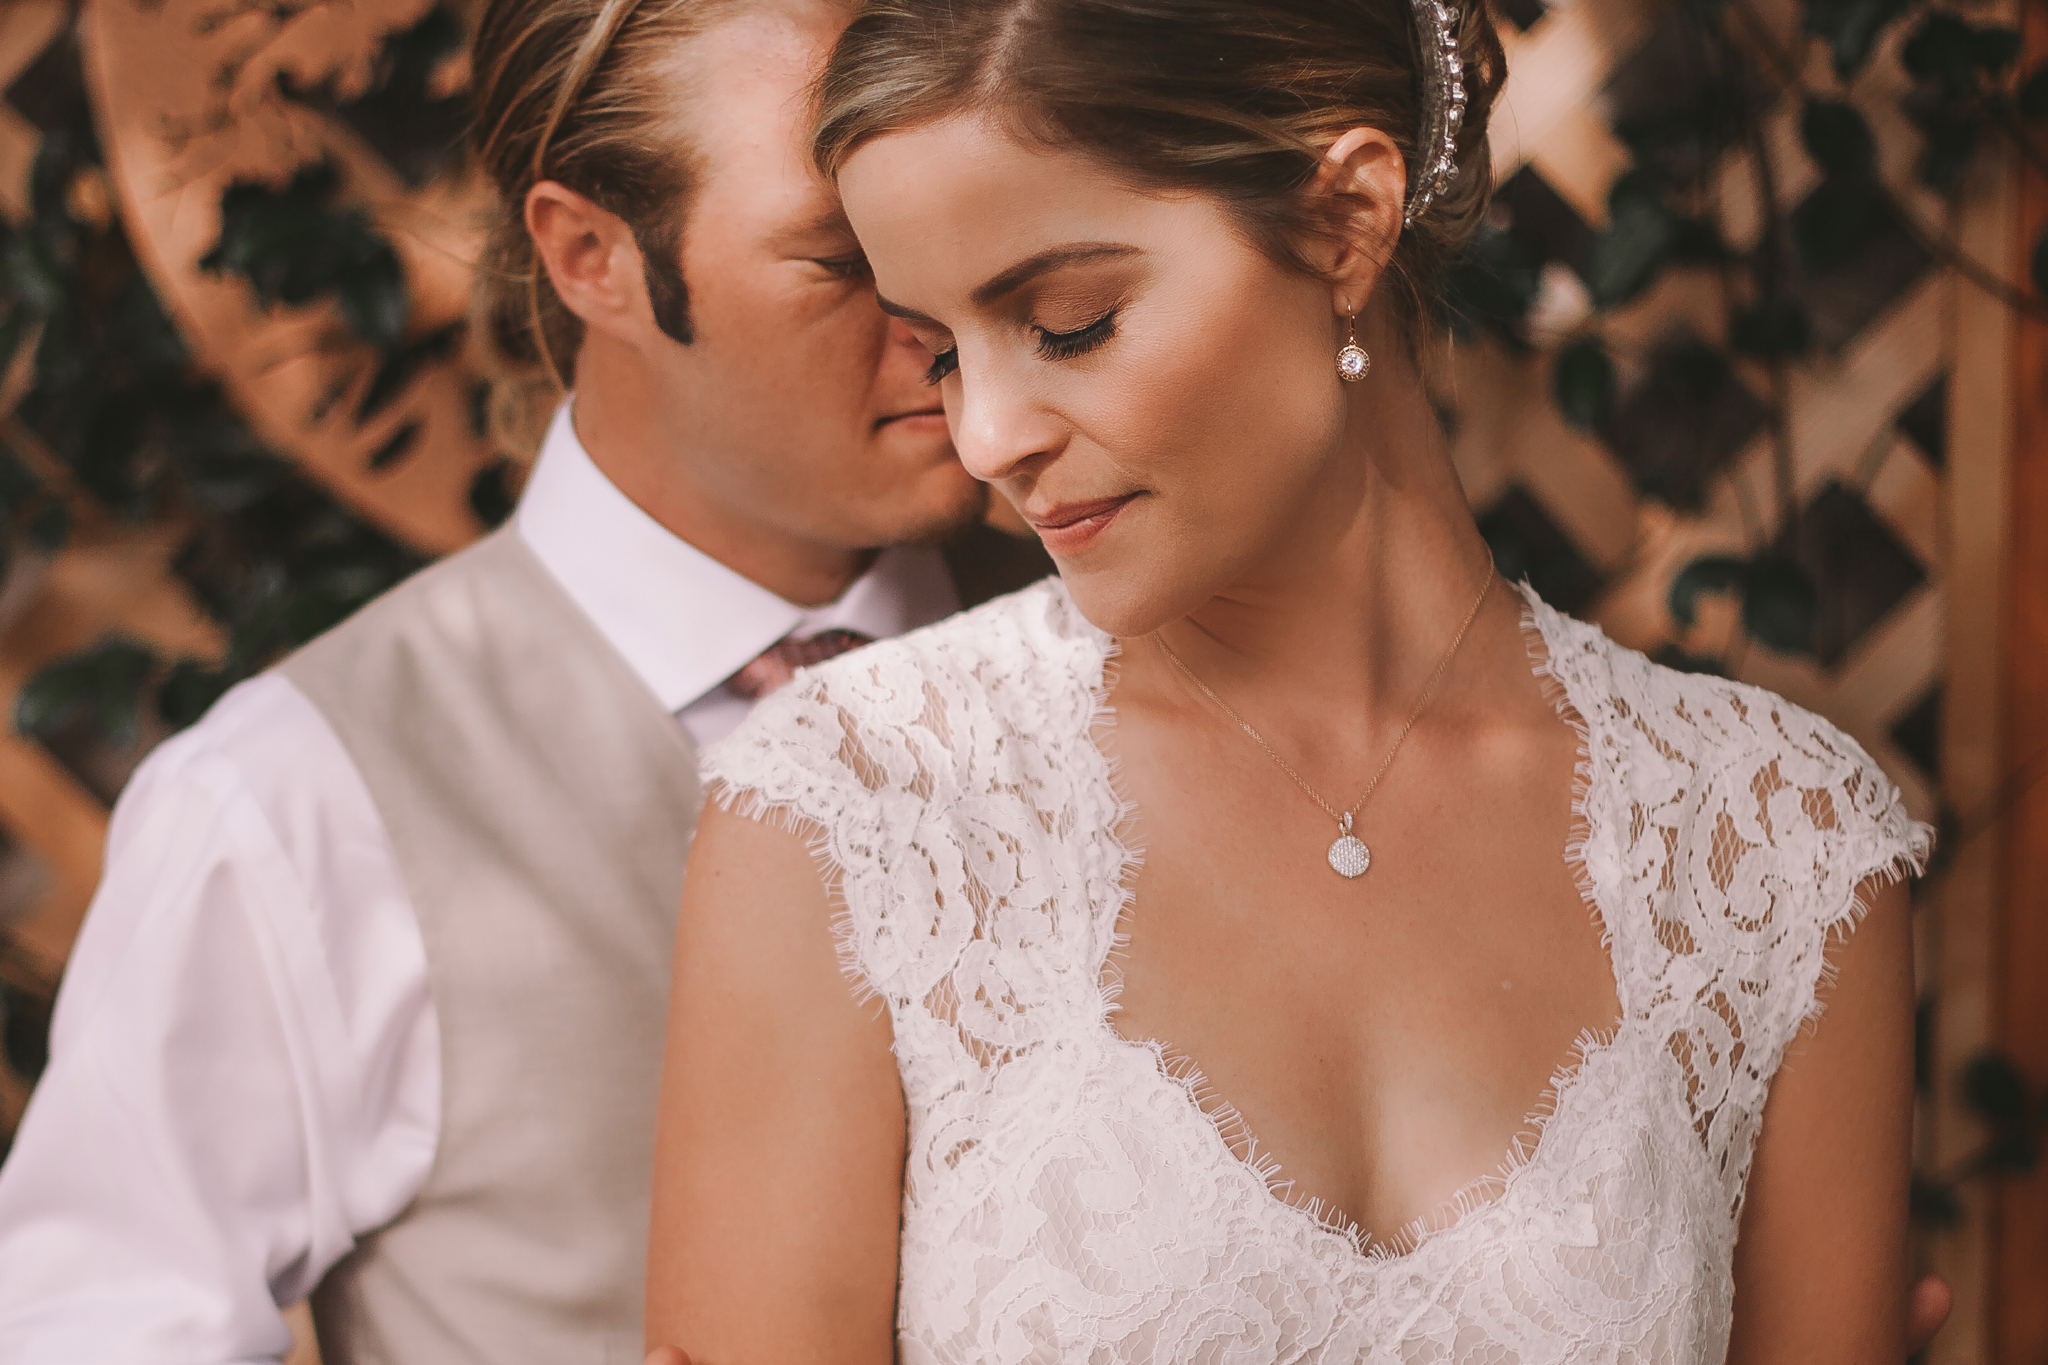 san diego wedding   photographer | man behind woman with closed eyes